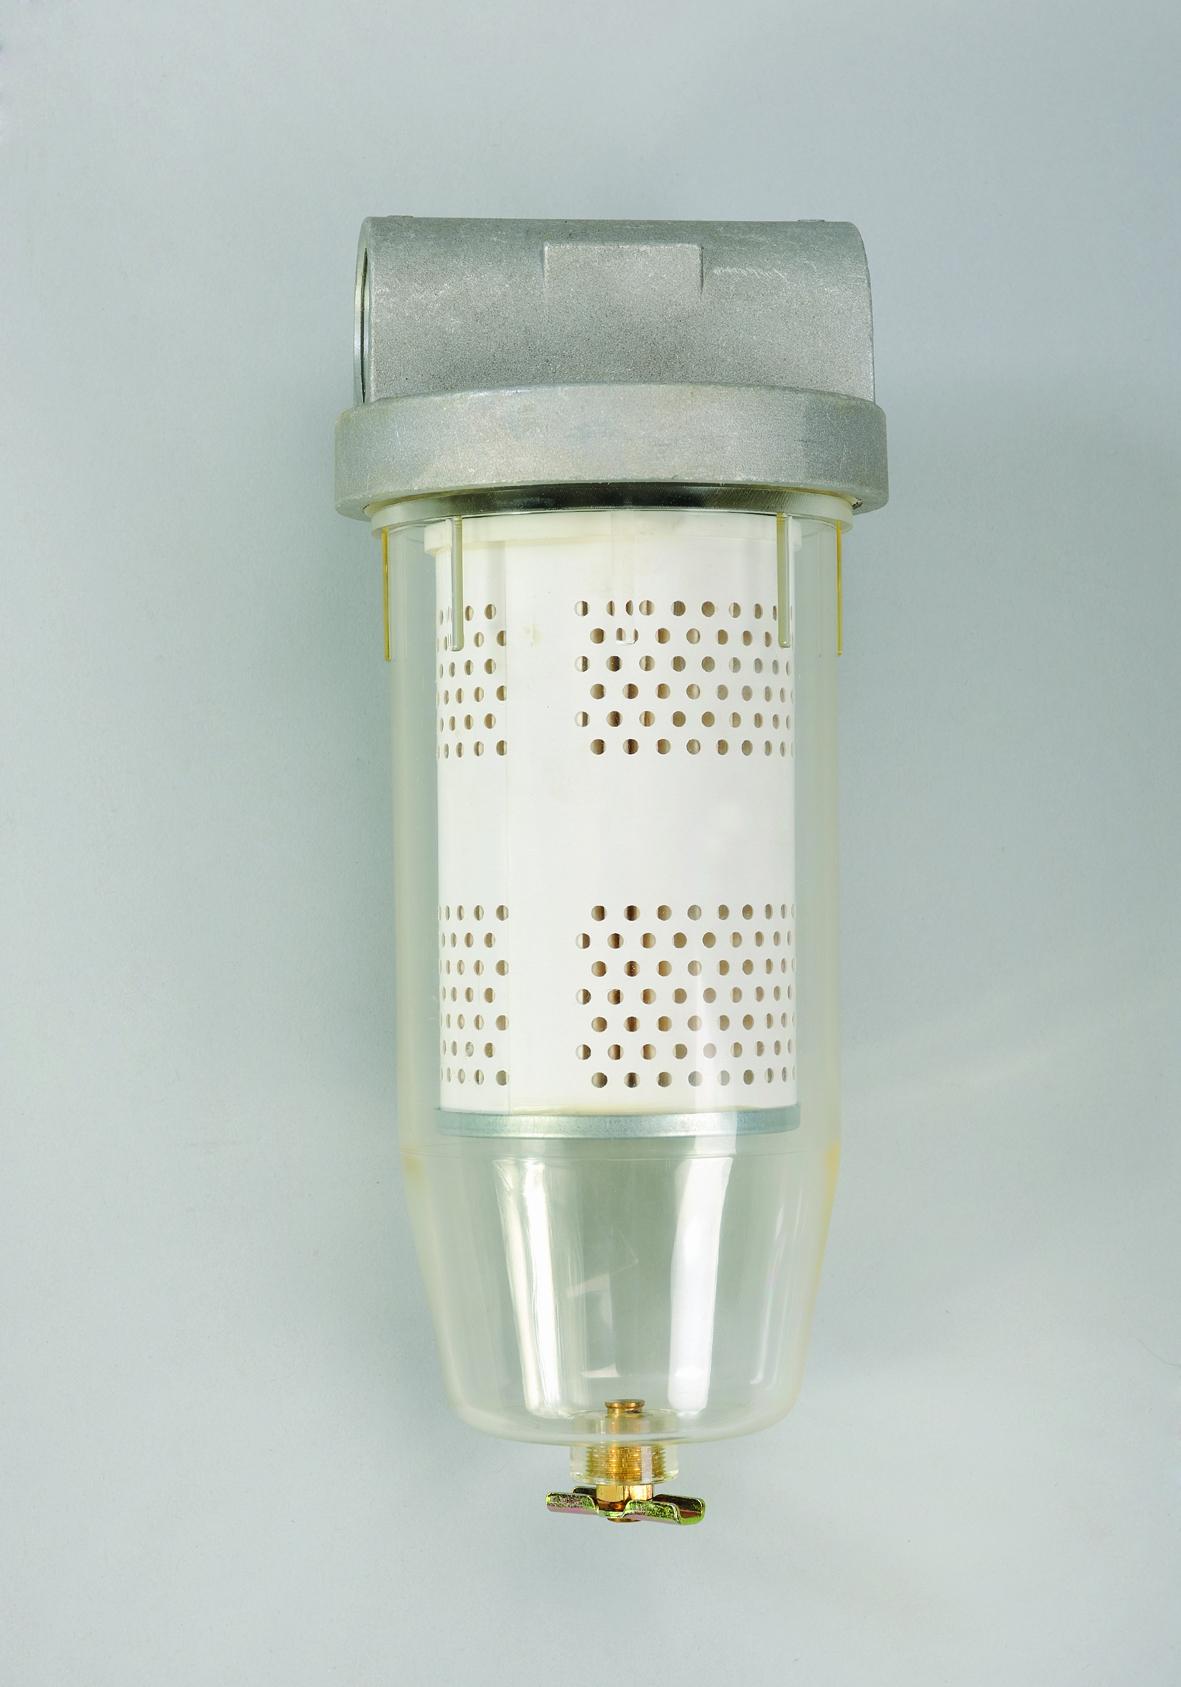 Model No Ff02 Fuel Filter Ige Industrial Garage Equipment A